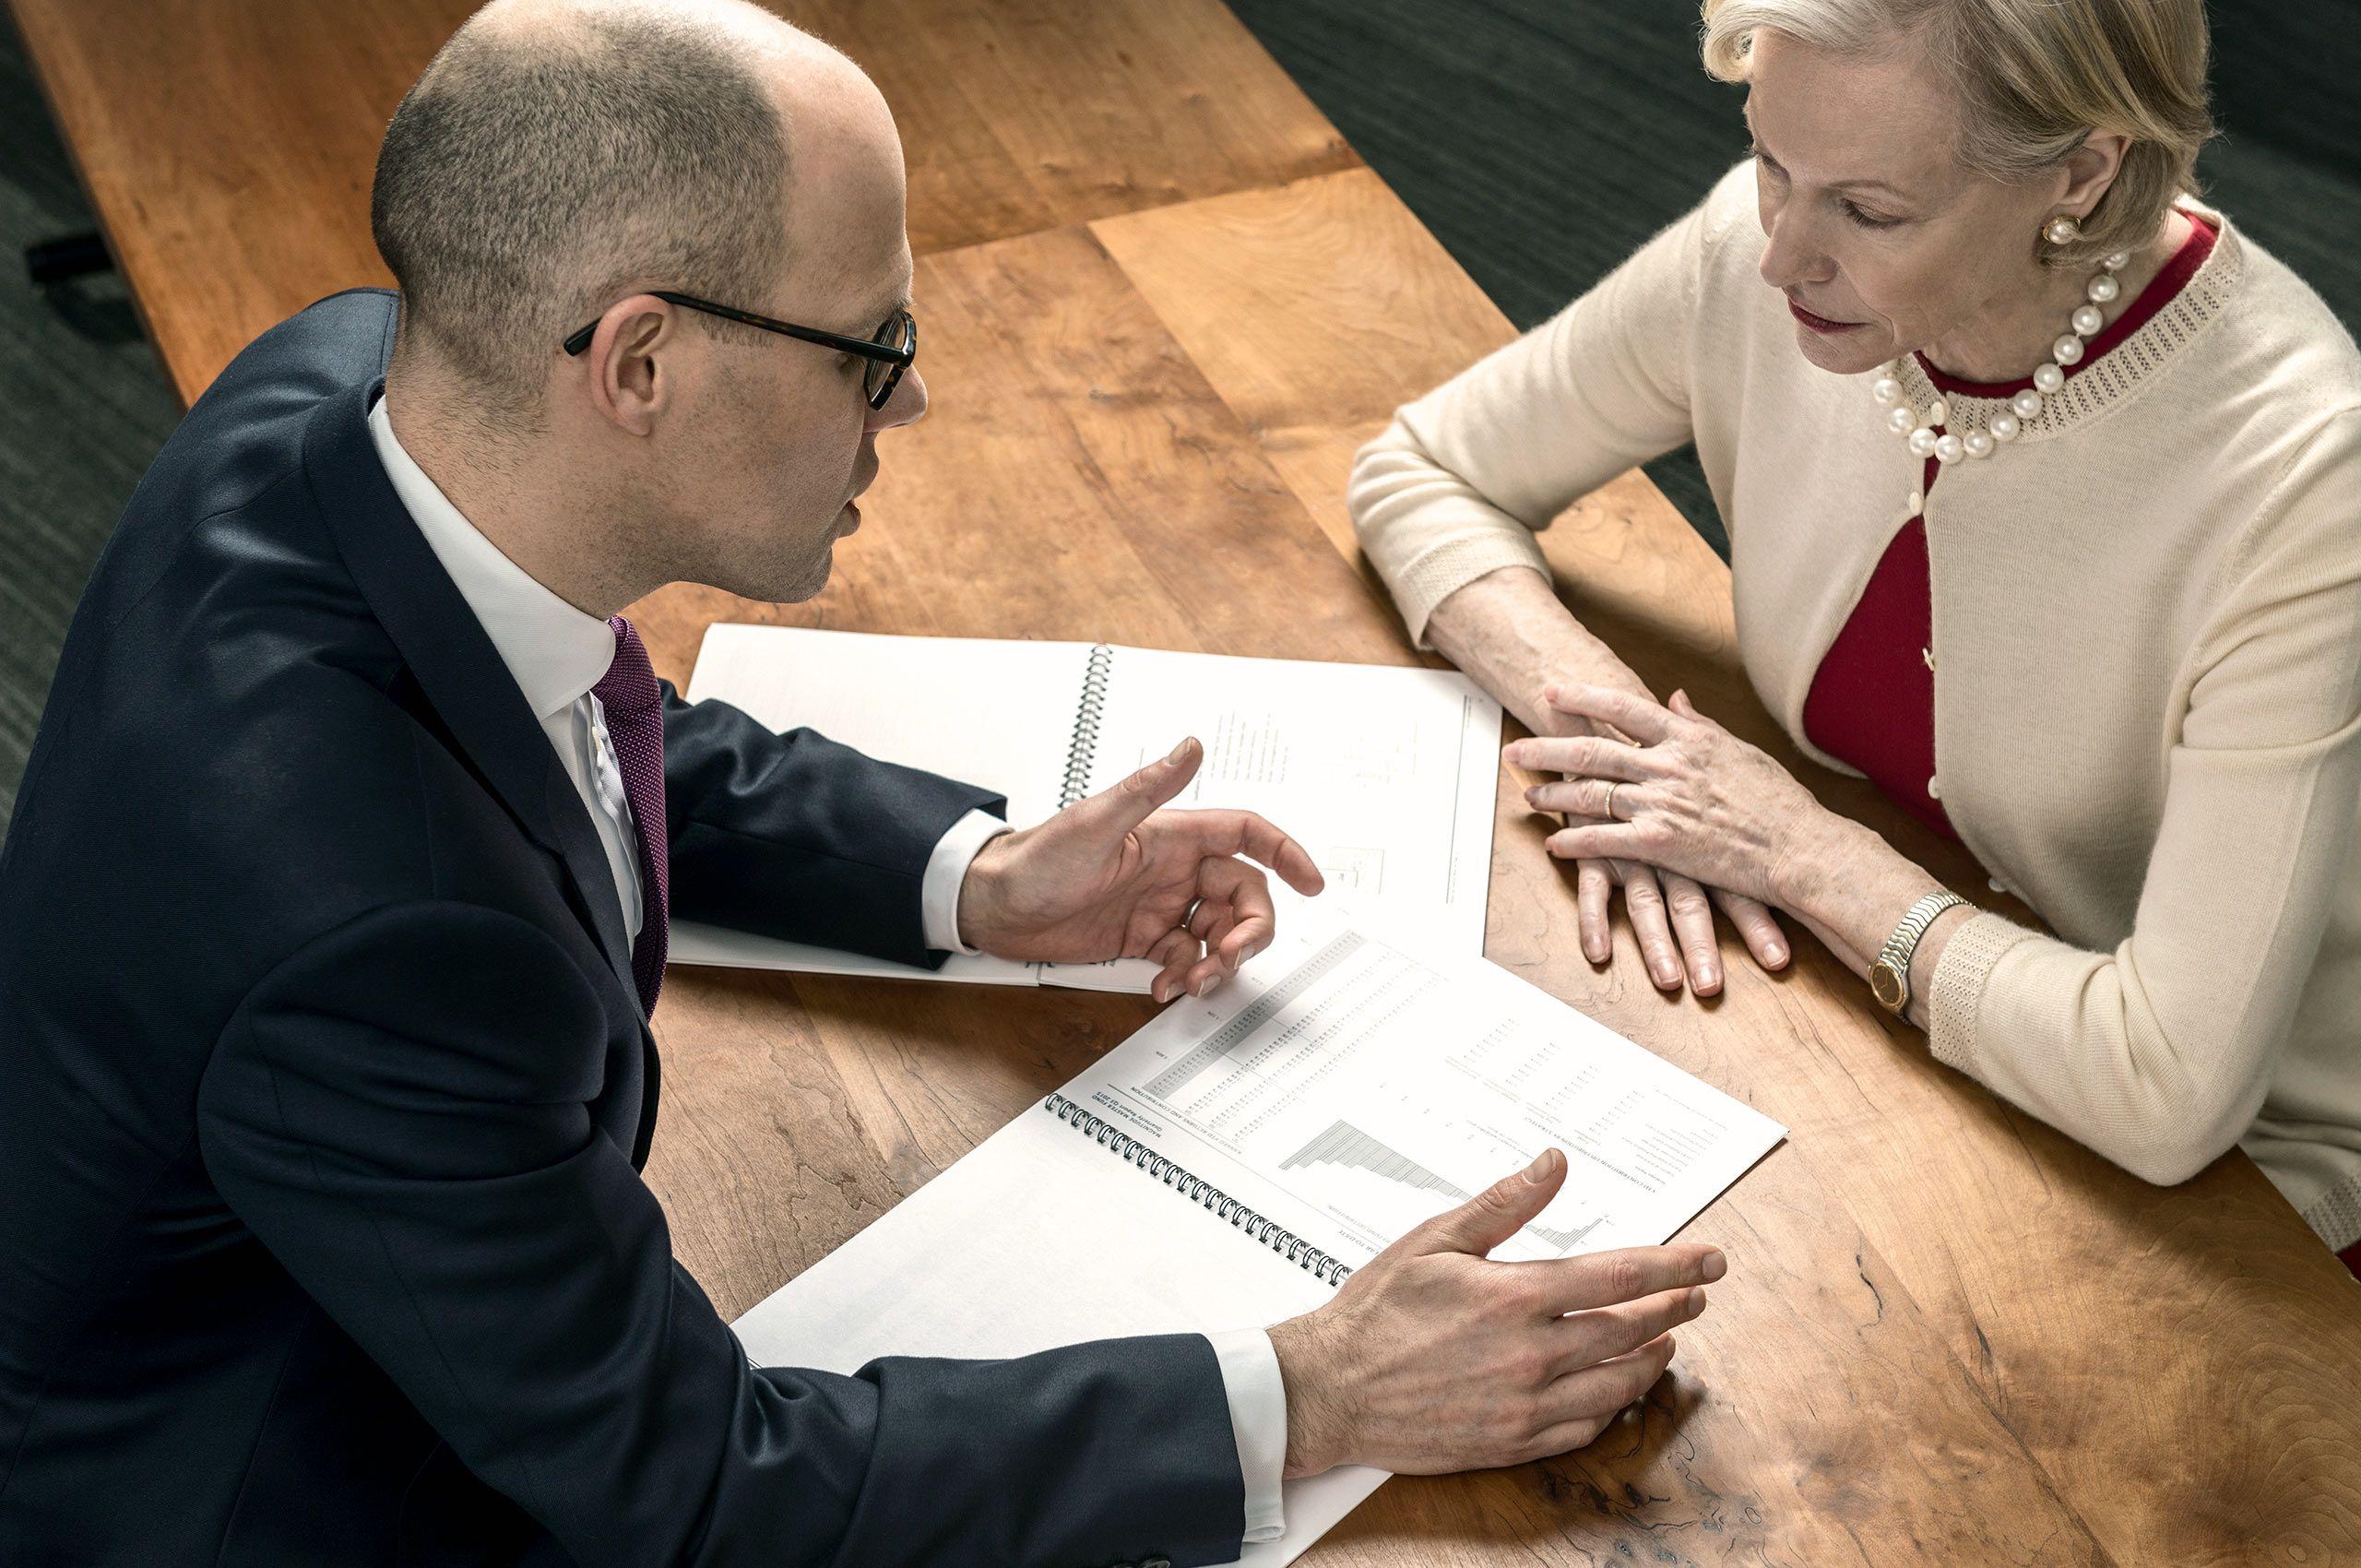 Client-Meeting-HenrikOlundPhotography.jpg